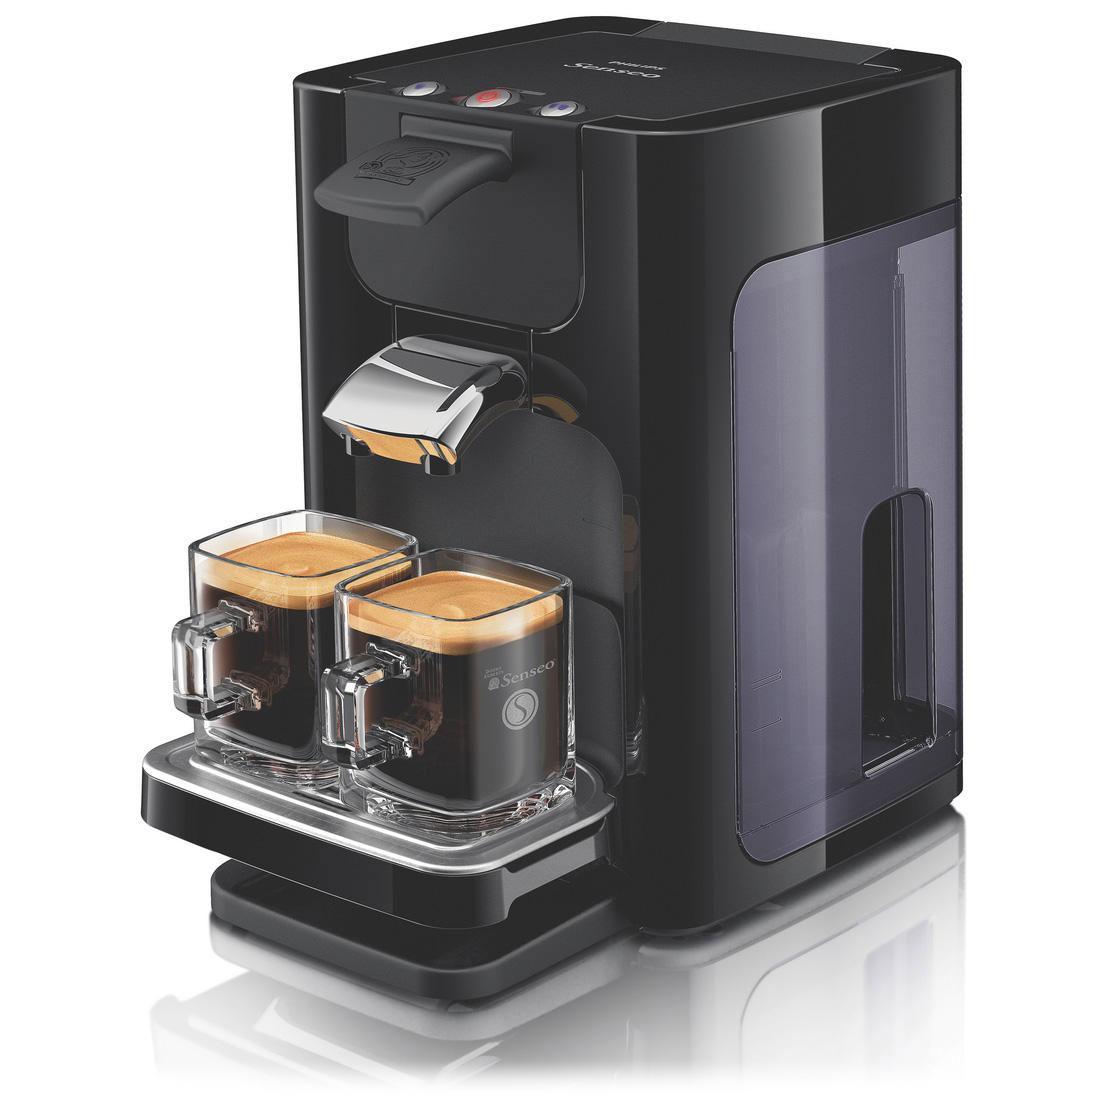 philips senseo quadrante hd 7860 60 black 2 x senseo. Black Bedroom Furniture Sets. Home Design Ideas